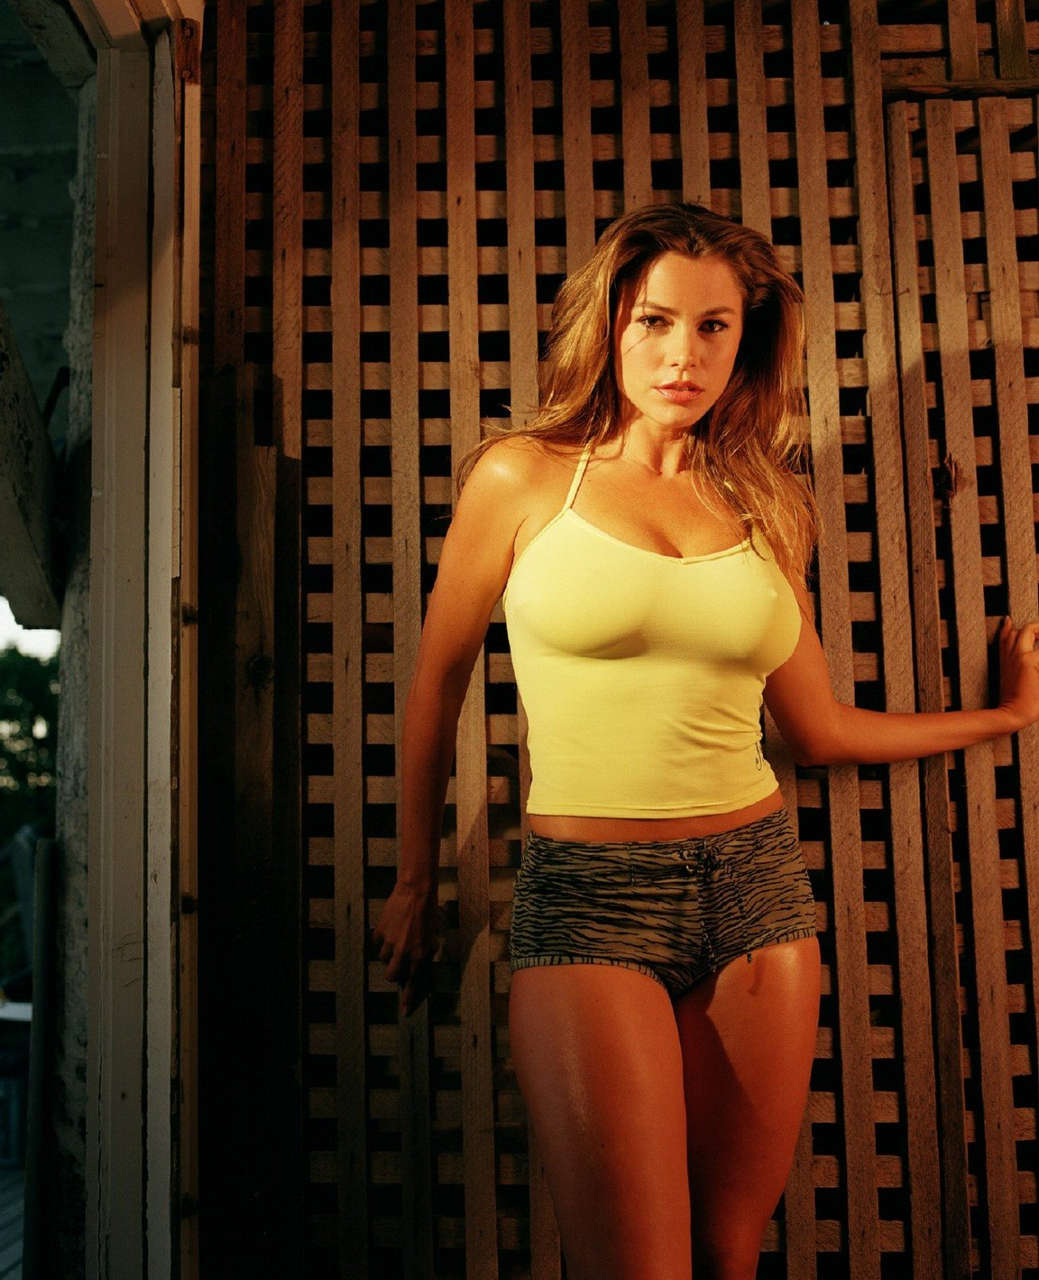 Found This Picture Of Sofia Vegara On R Pics NSFW